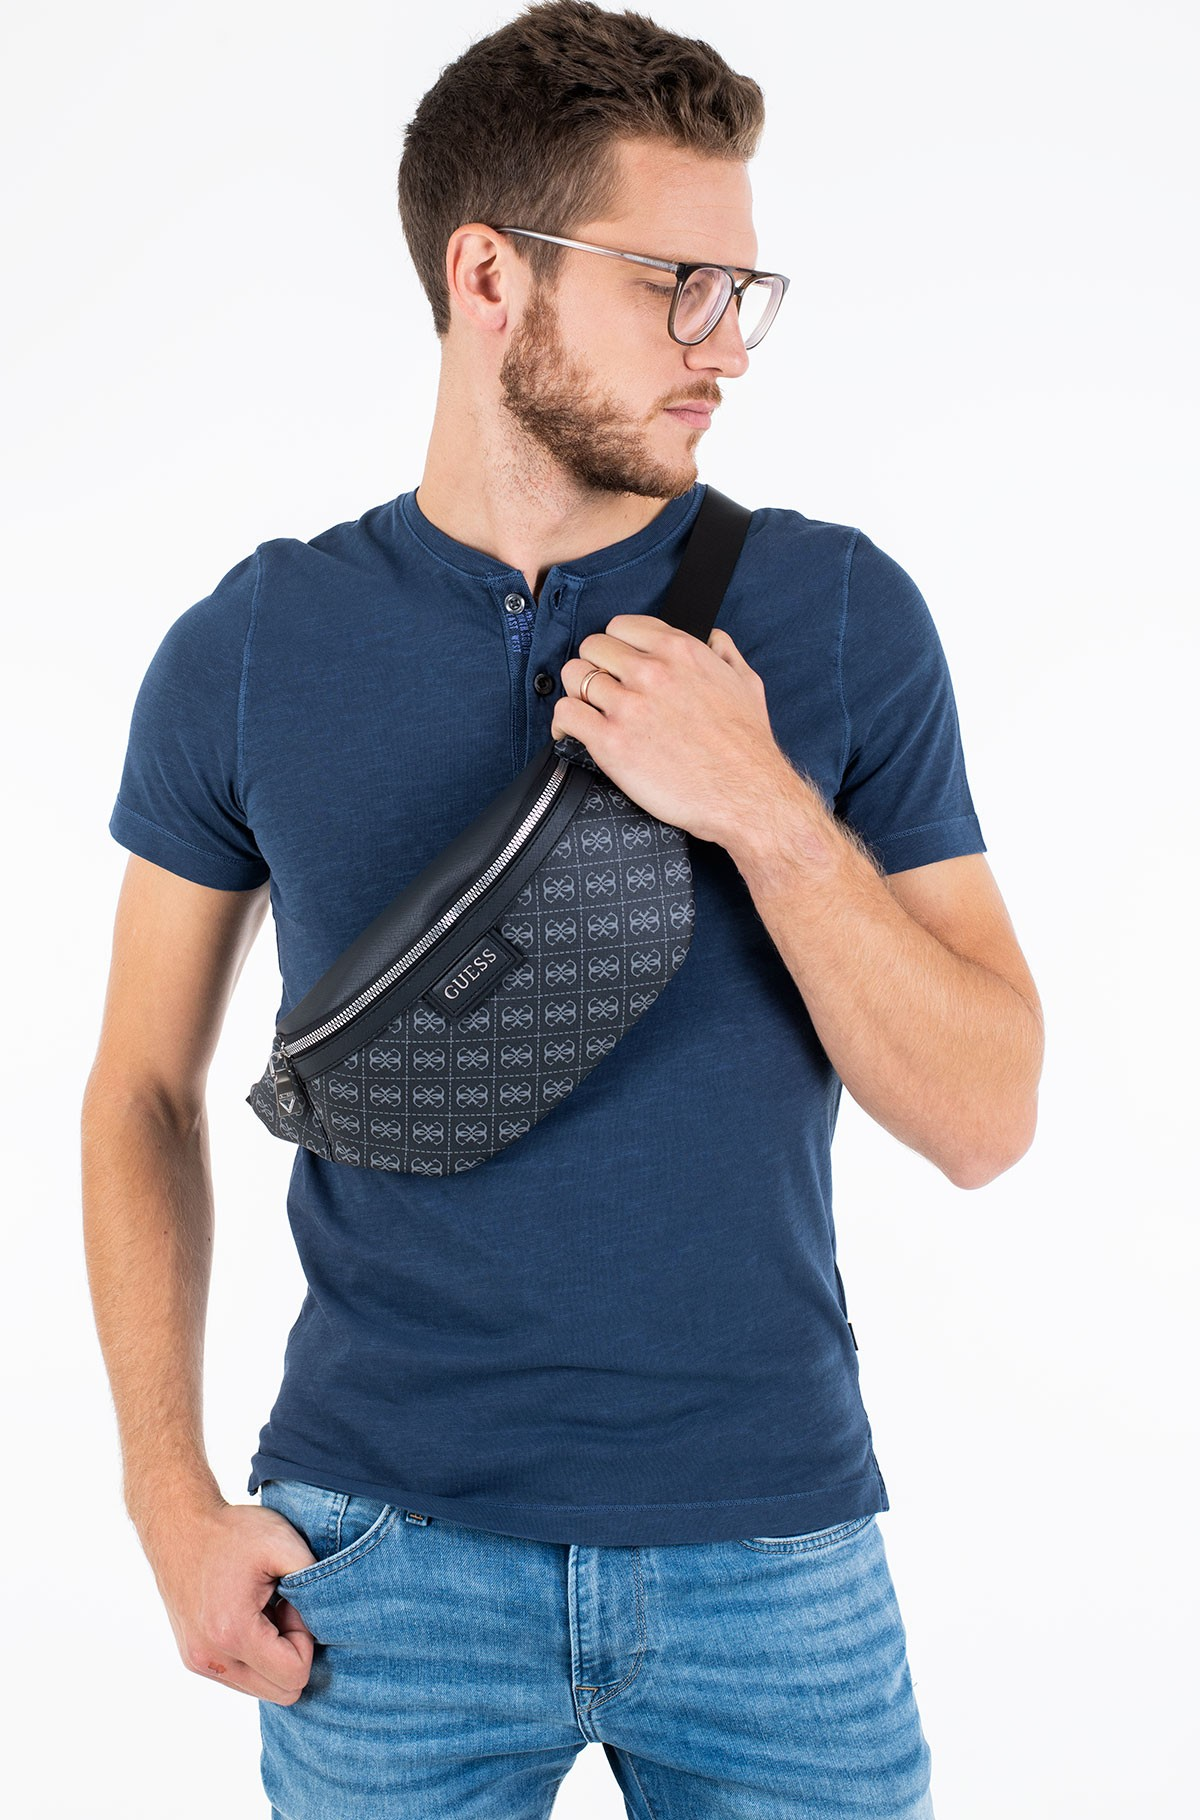 Waist bag/shoulder bag HMDANL P0330-full-1